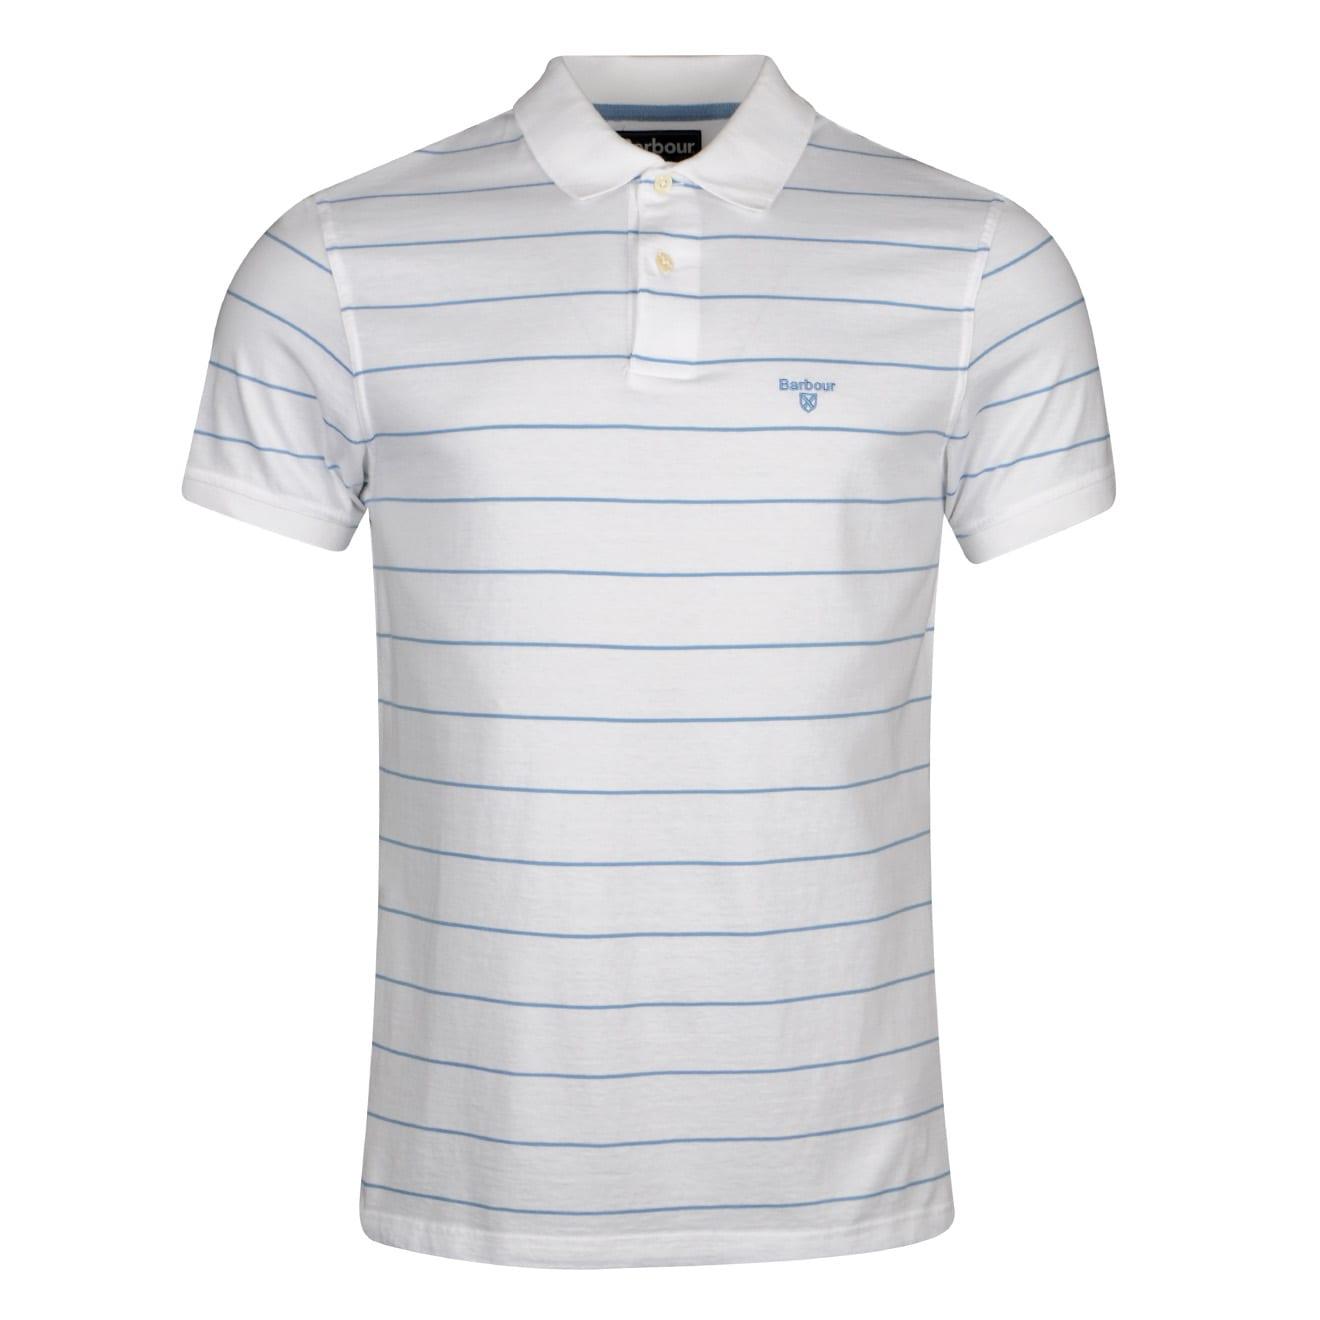 Barbour Bodmin Stripe Polo Shirt White